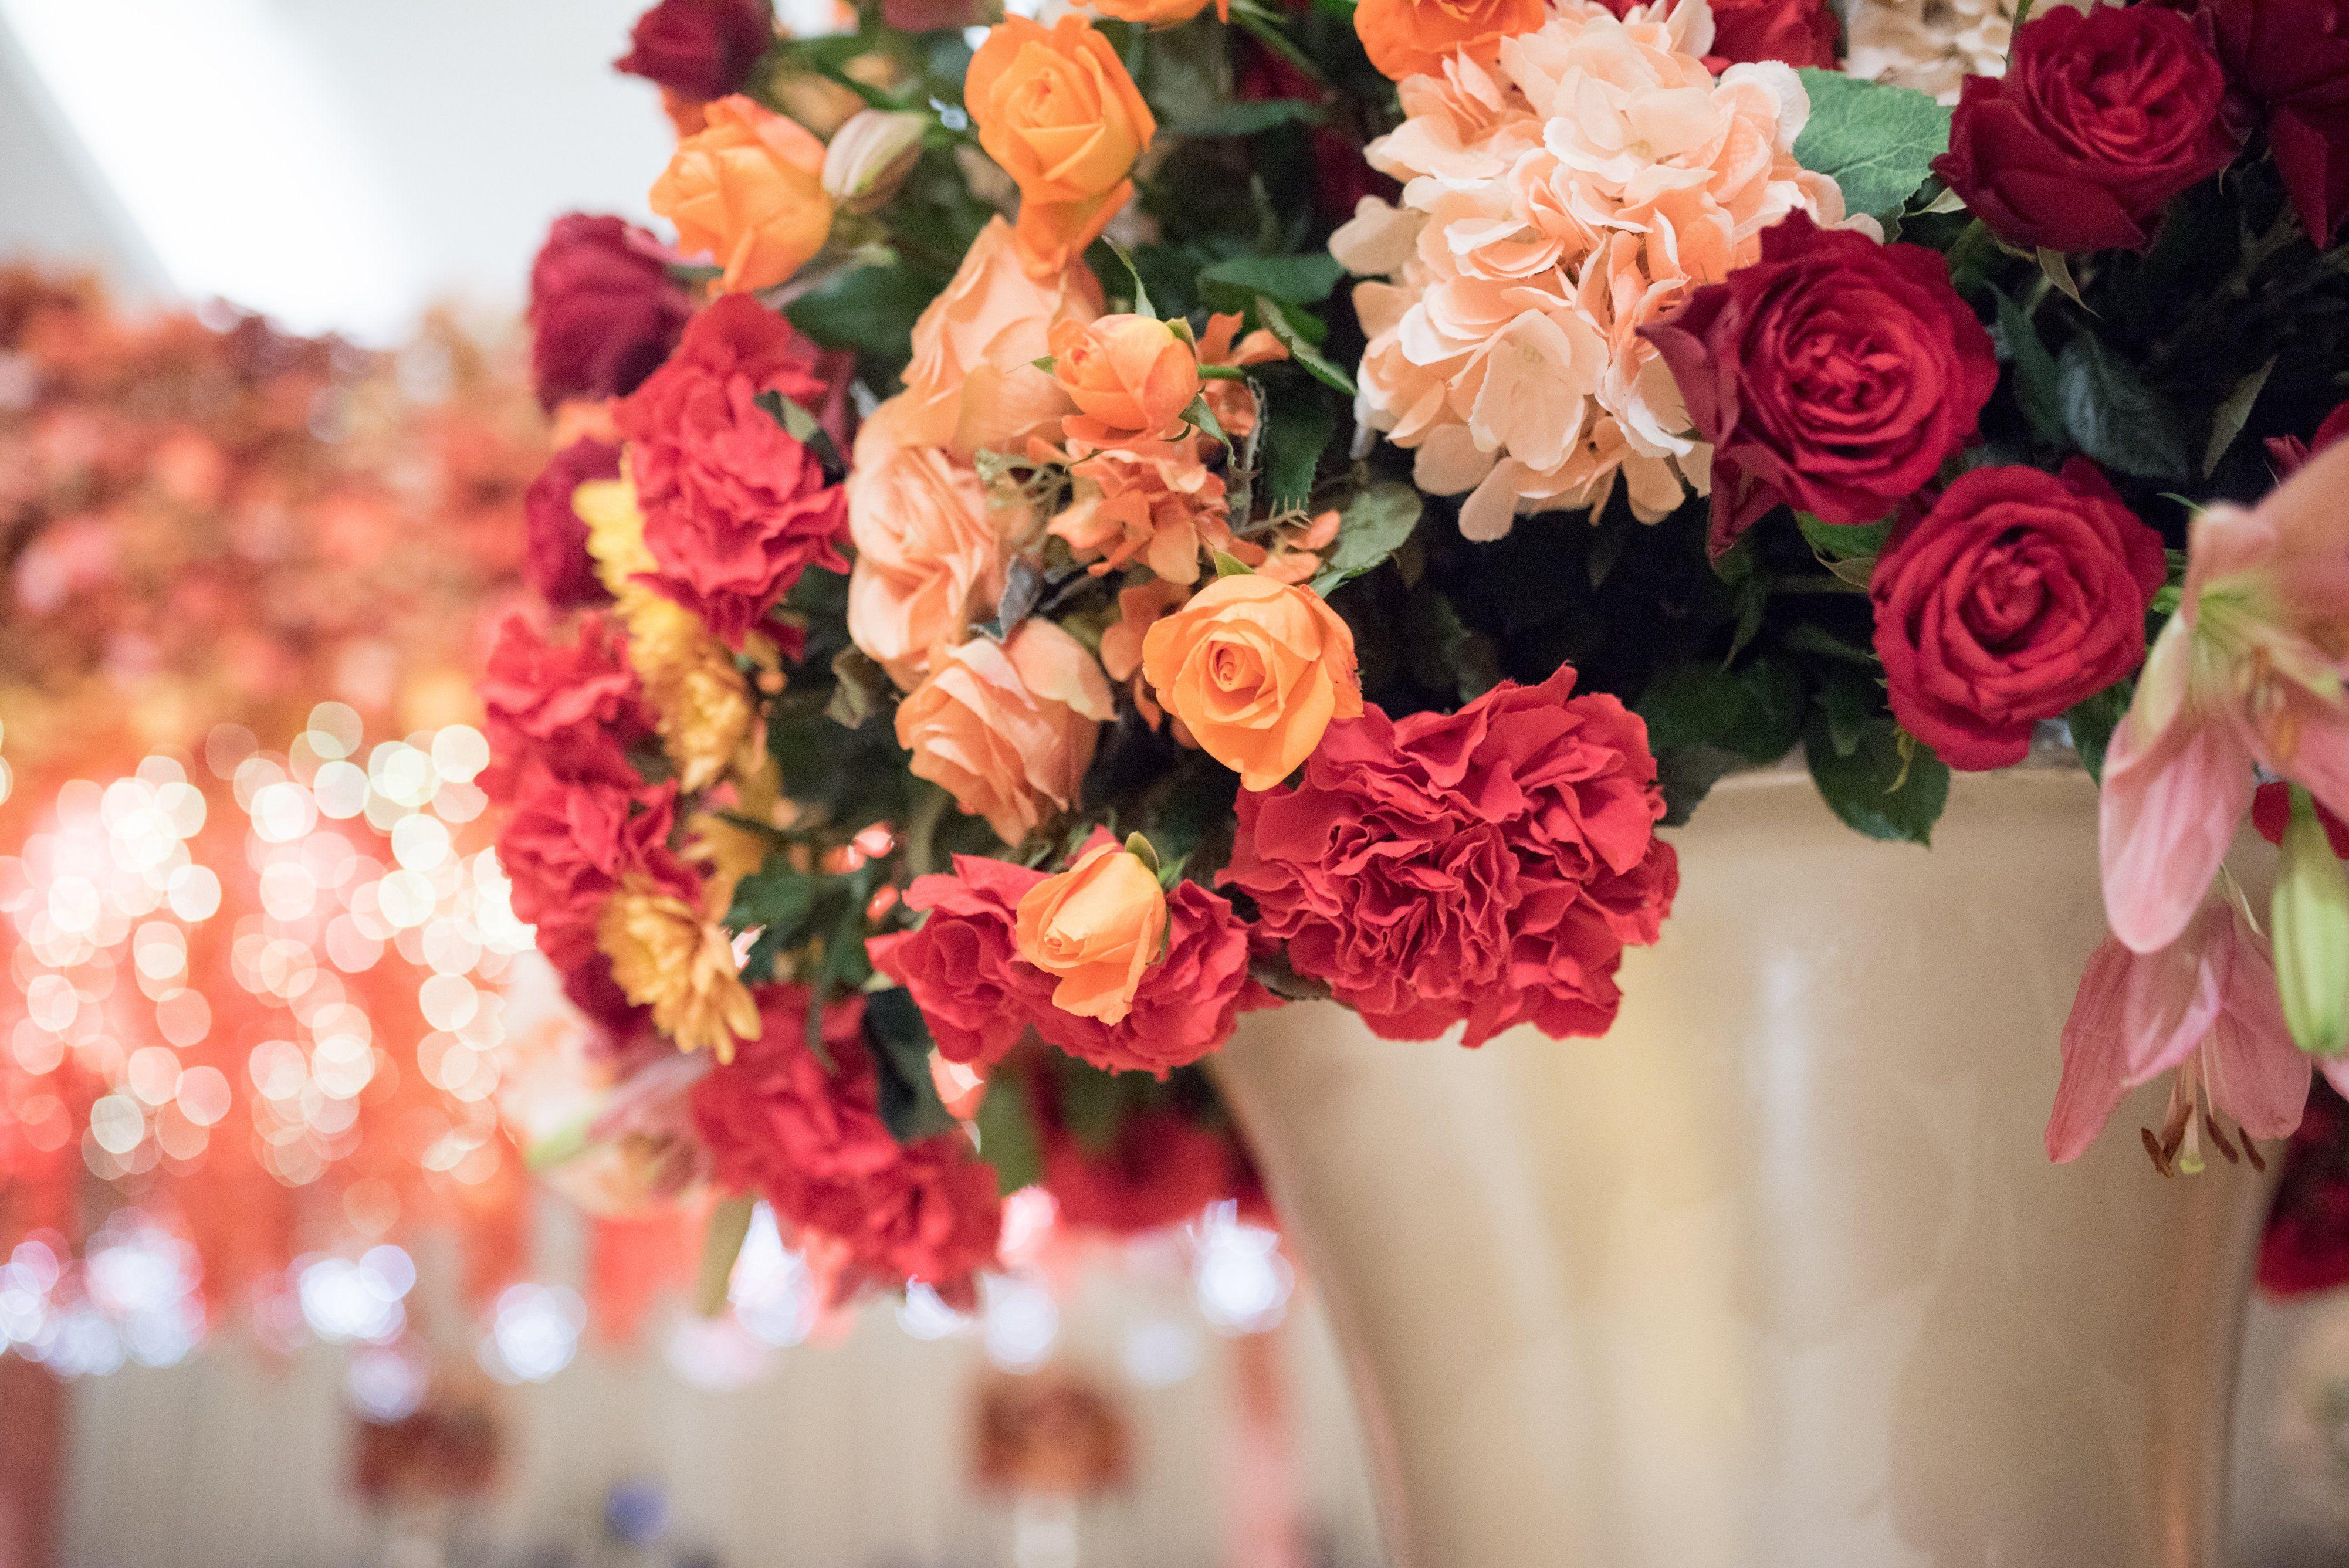 Colours scheme of the flowers #autumn #wedding | Wedding | Pinterest ...